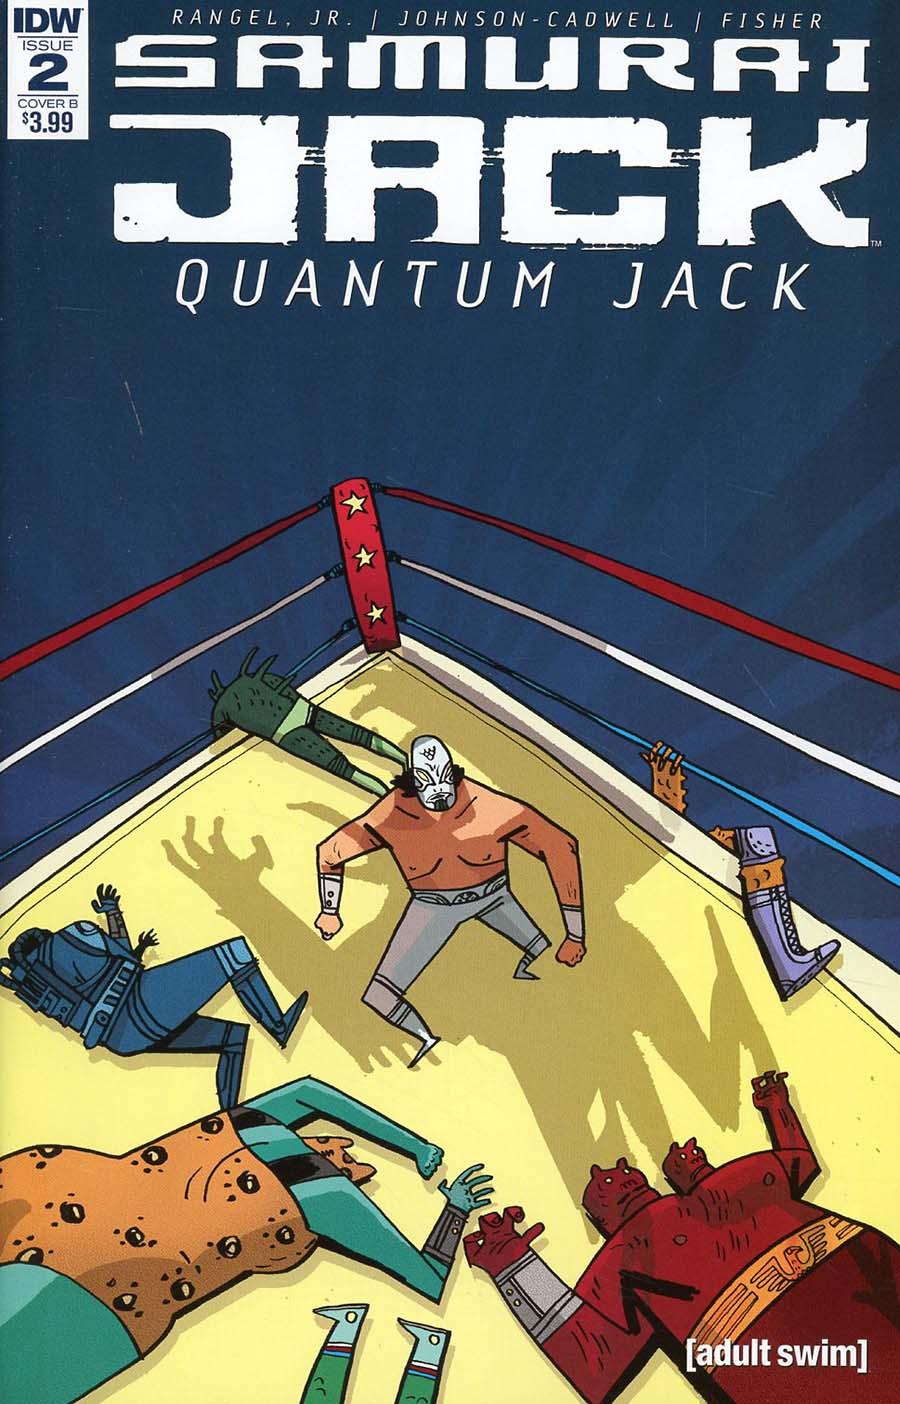 Samurai Jack Quantum Jack #2 Cover B Variant Warwick Johnson Cadwell Cover